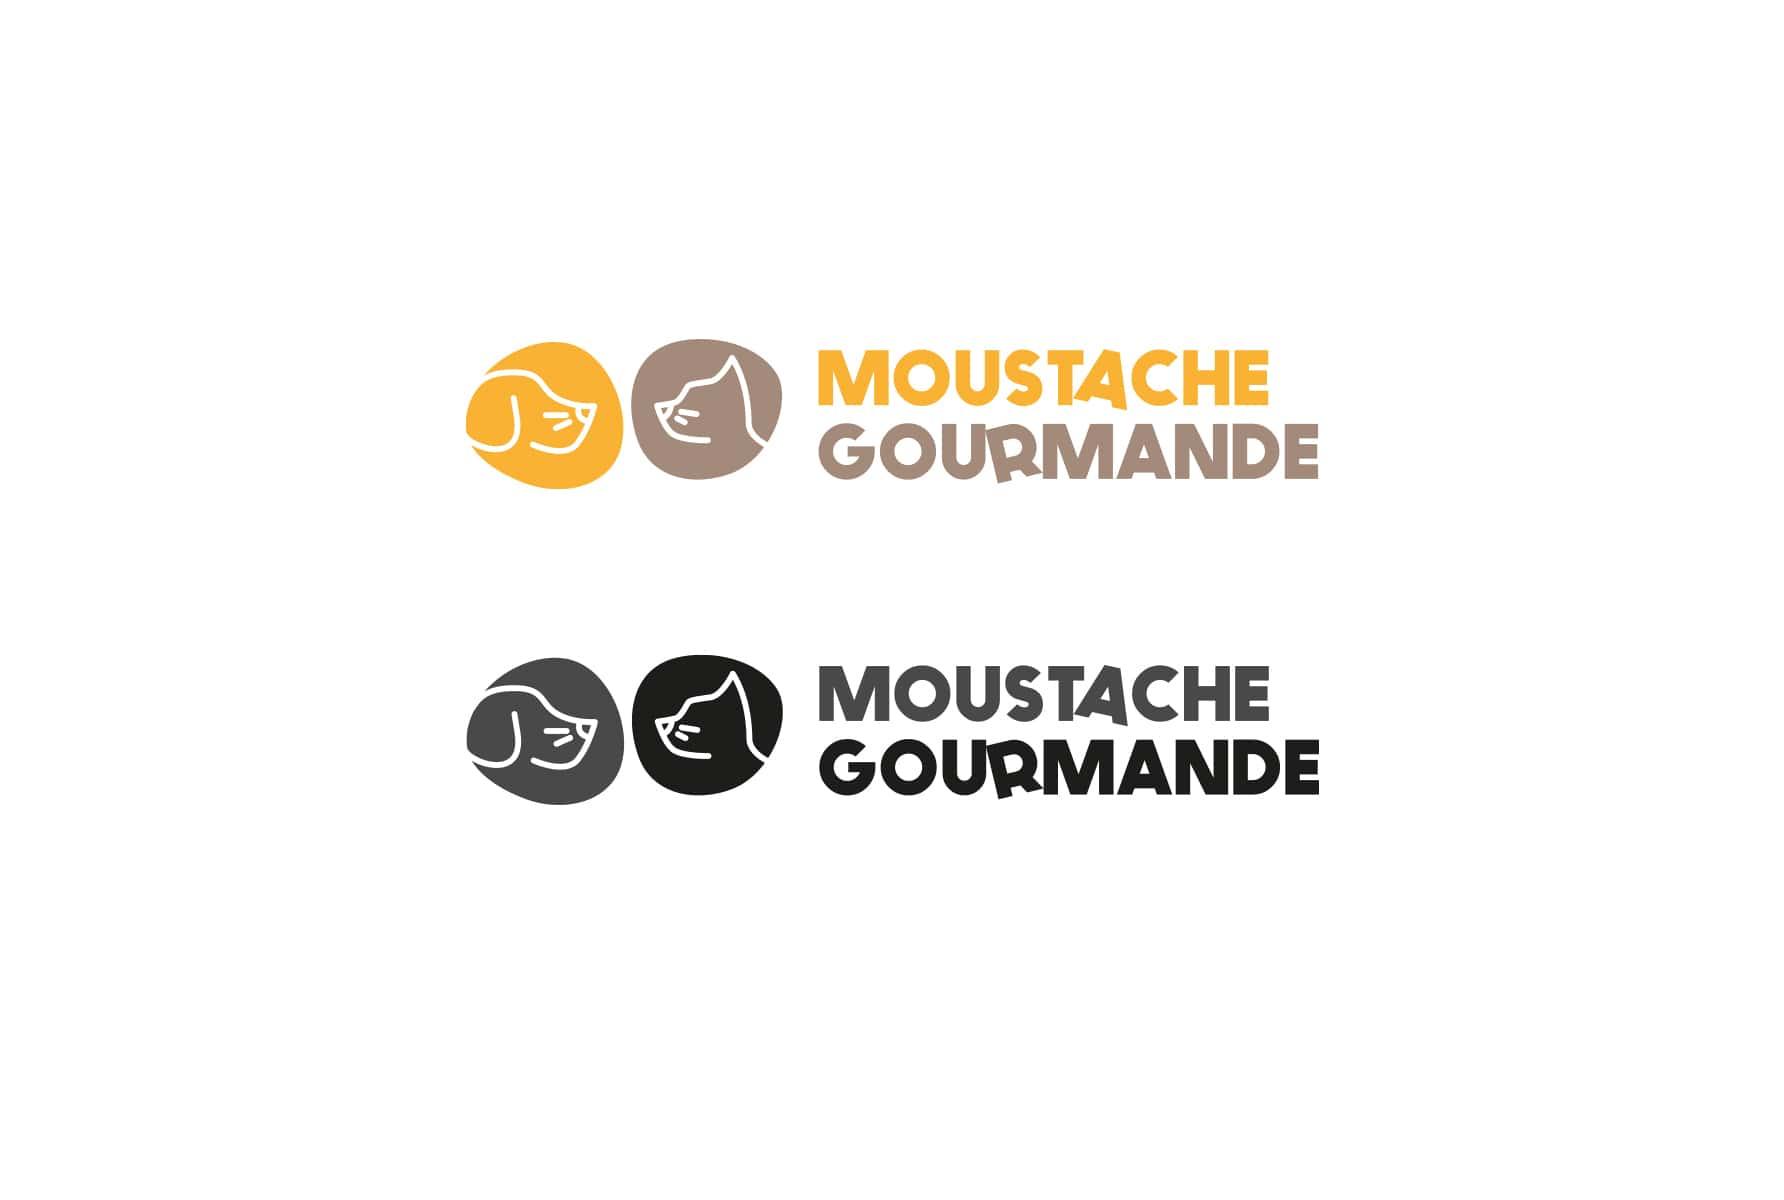 ikadia-moustache-gourmande-1